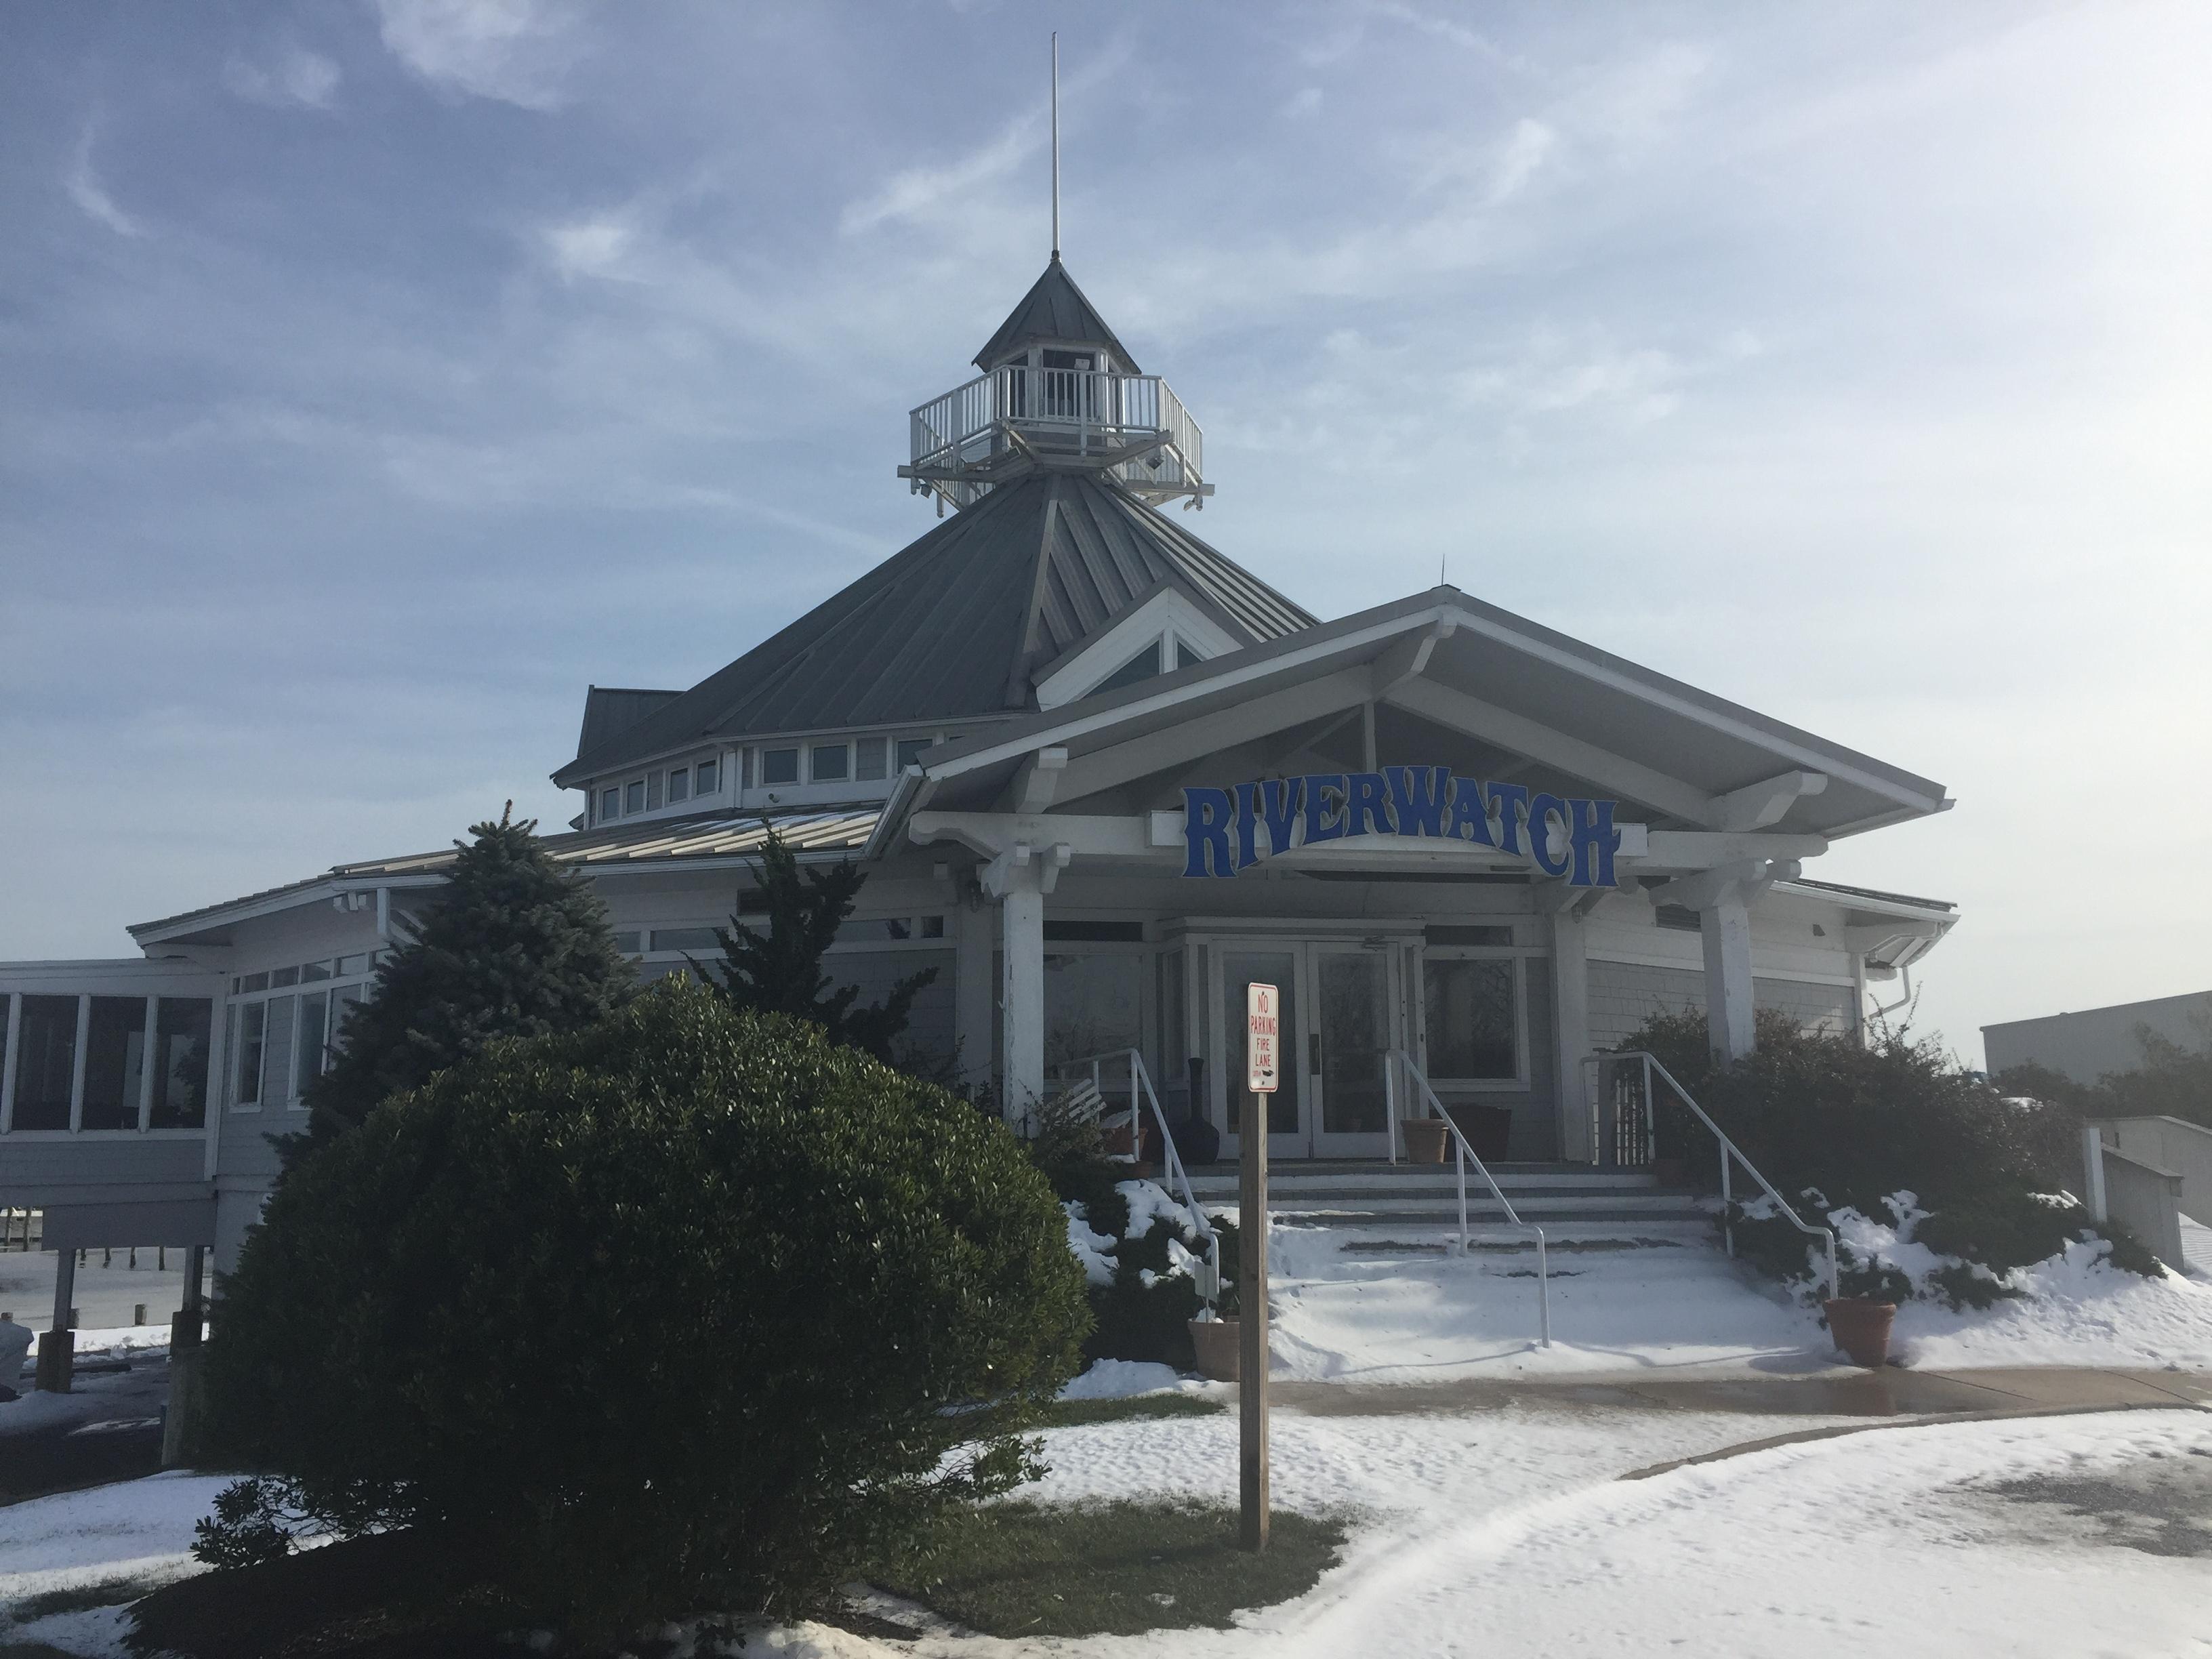 The former Riverwatch restaurant in Brick, N.J. (Photo: Daniel Nee)